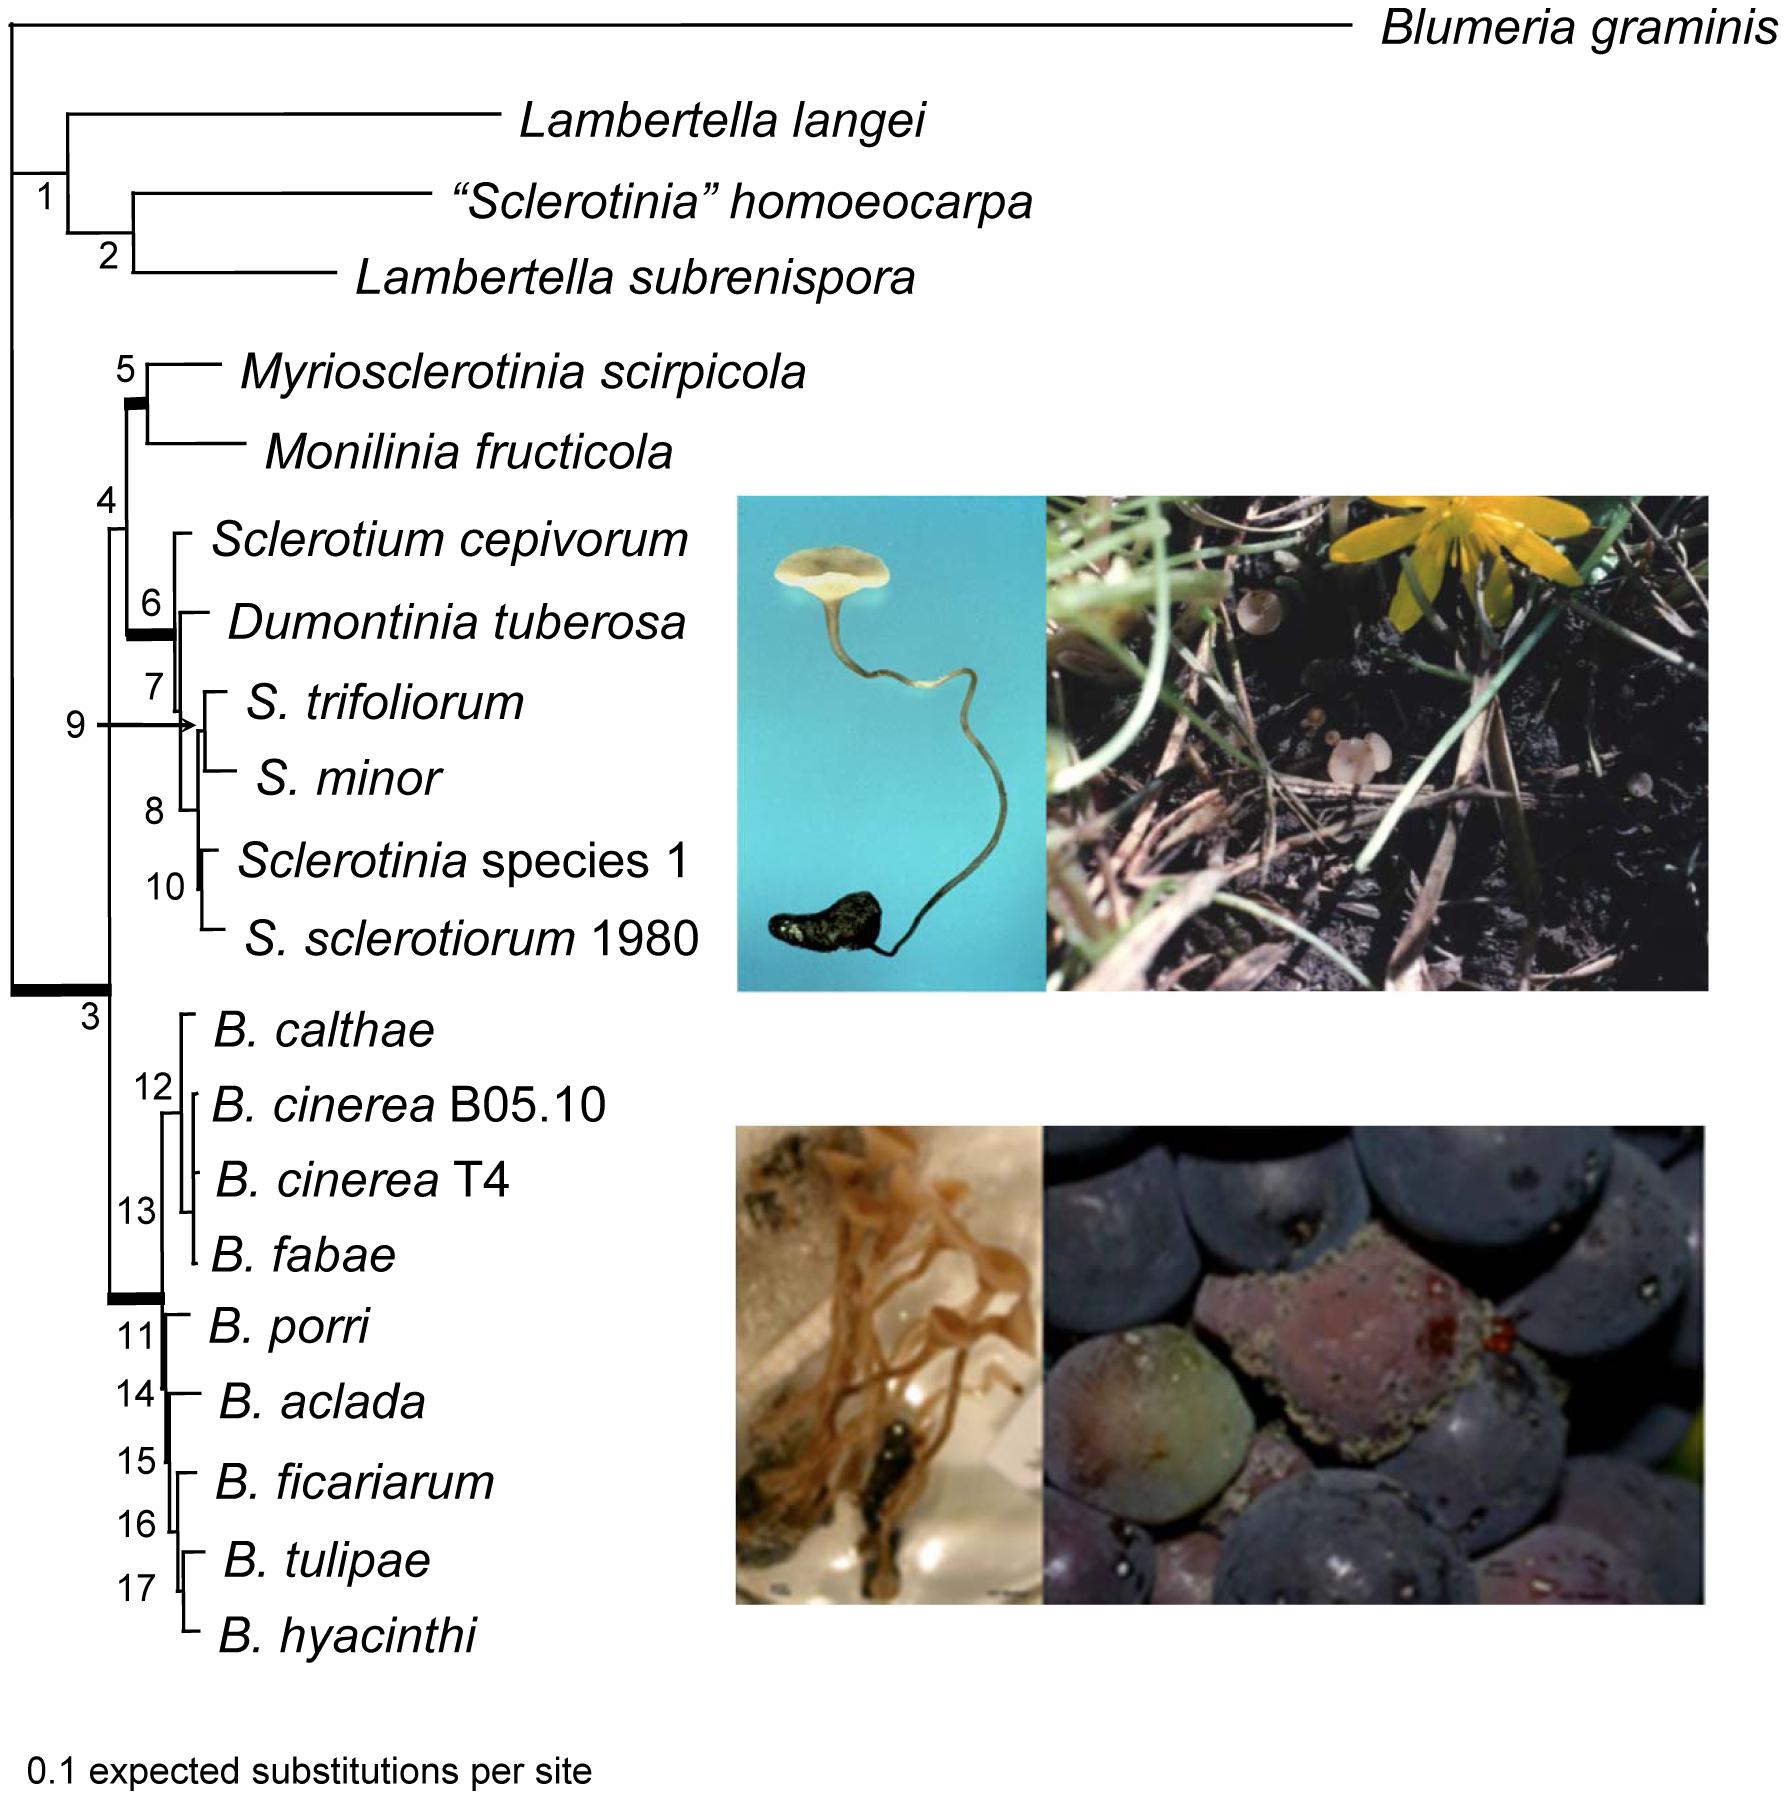 "Phylogeny of the Sclerotiniaceae (Ascomycota, Leotiomycetes, Helotiales), the sister group Rutstroemiaceae (represented by <i>Lambertella</i> species and ""<i>Sclerotinia</i>"" <i>homoeocarpa</i>), and the outgroup, <i>Blumeria graminis</i> (Leotiomycetes, Erysiphales)."